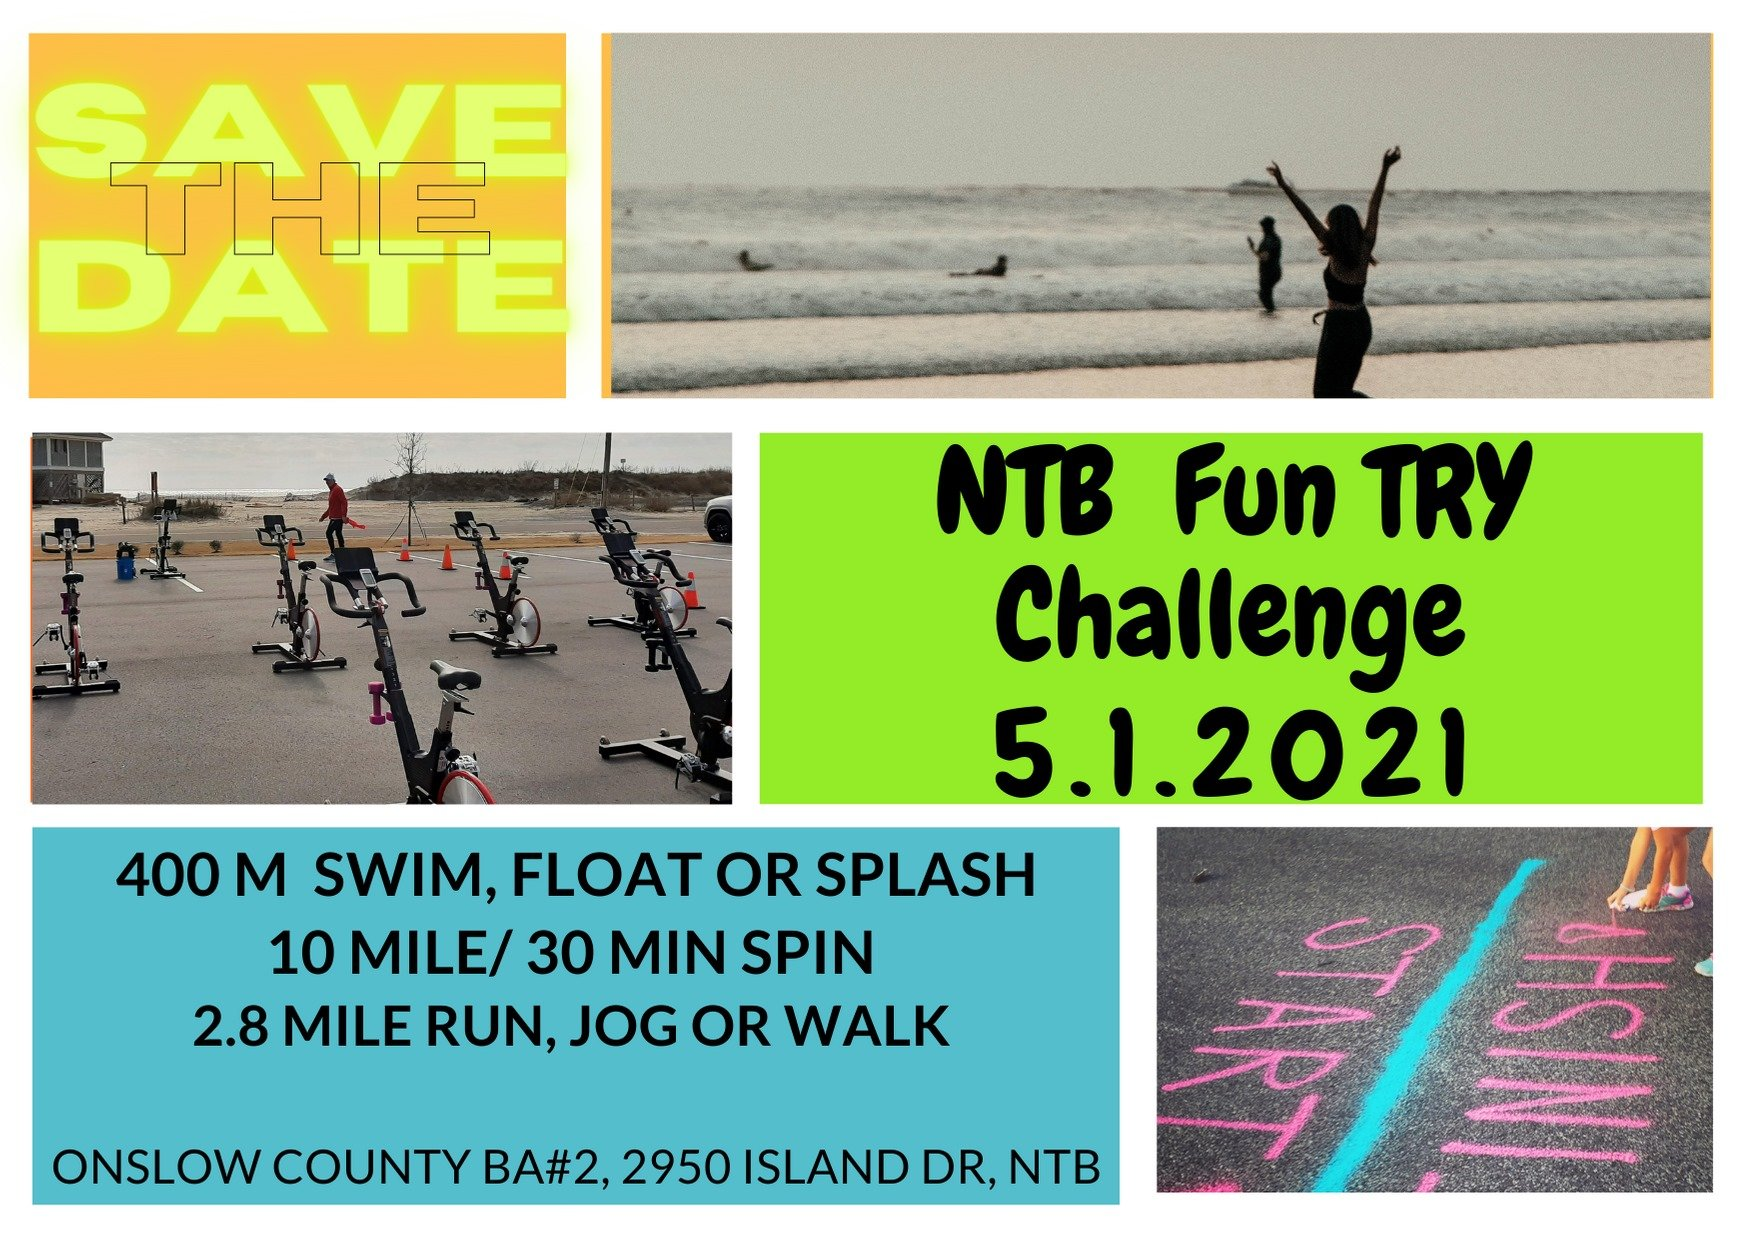 NTB Fun TRY Challenge - North Topsail Beach, NC